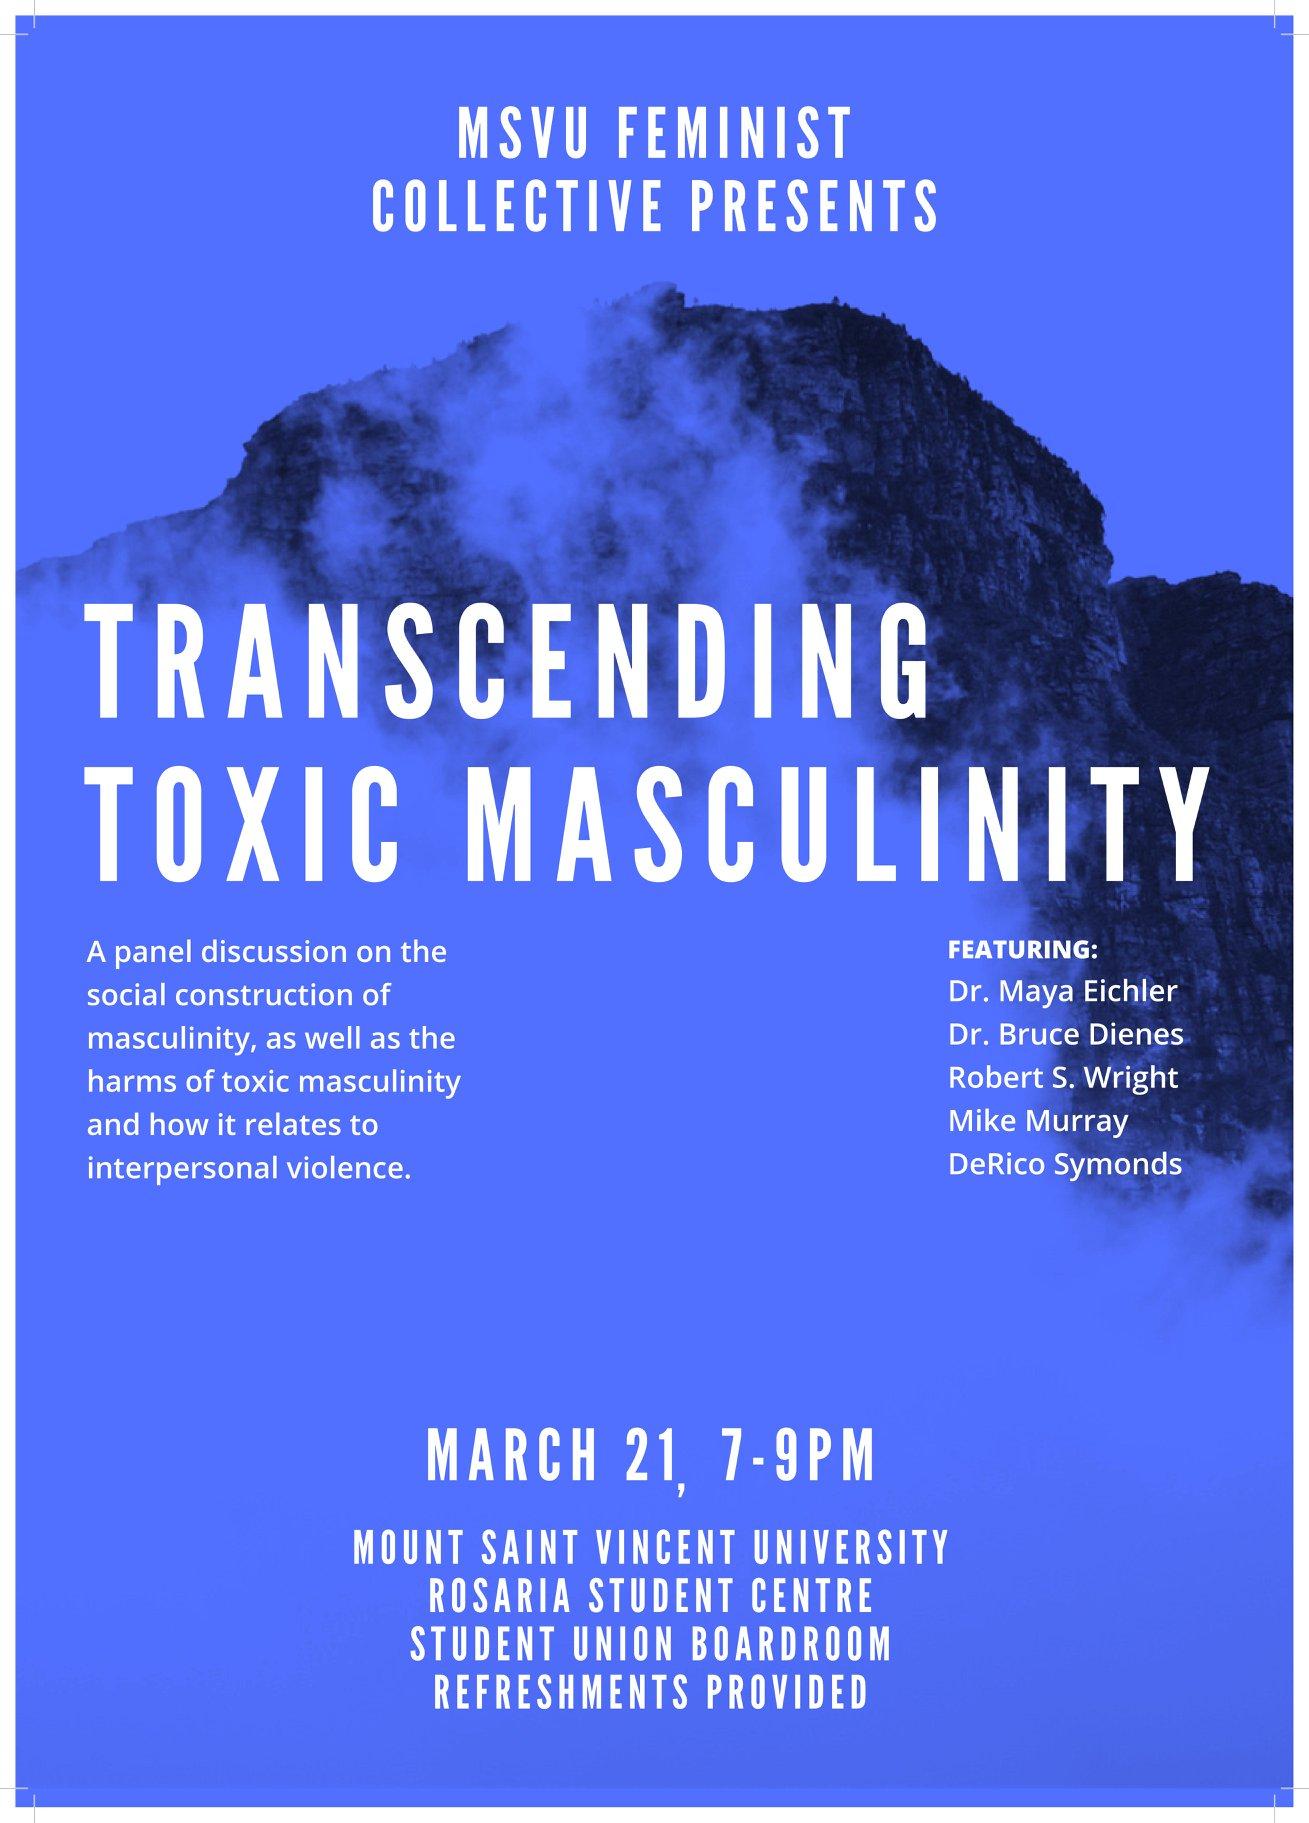 toxic masculinity panel